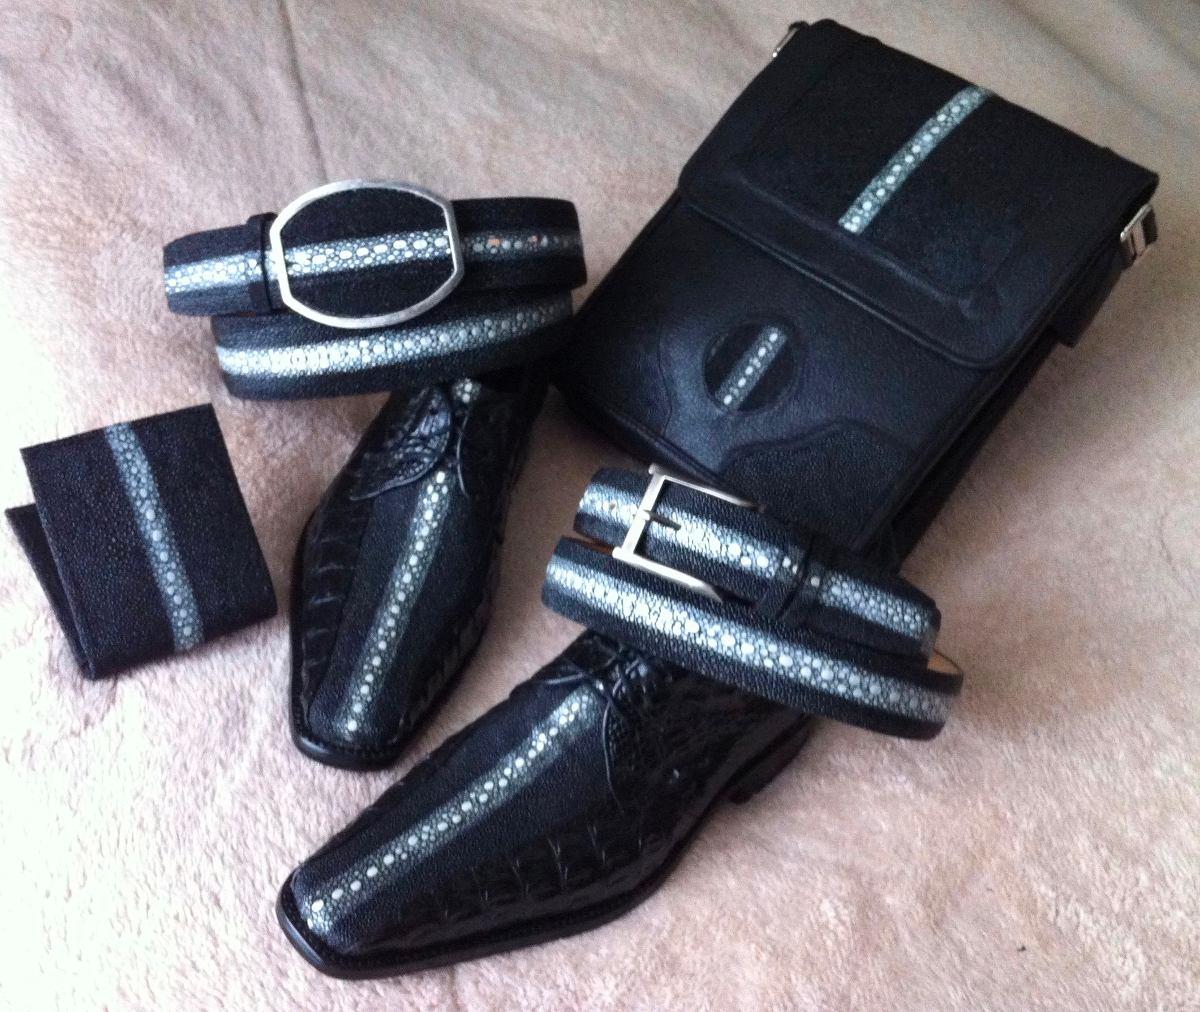 Botas de avestruz color gris ropa bolsas y calzado en mercadolibre - Zapatos En Pieles Finas Para Caballero